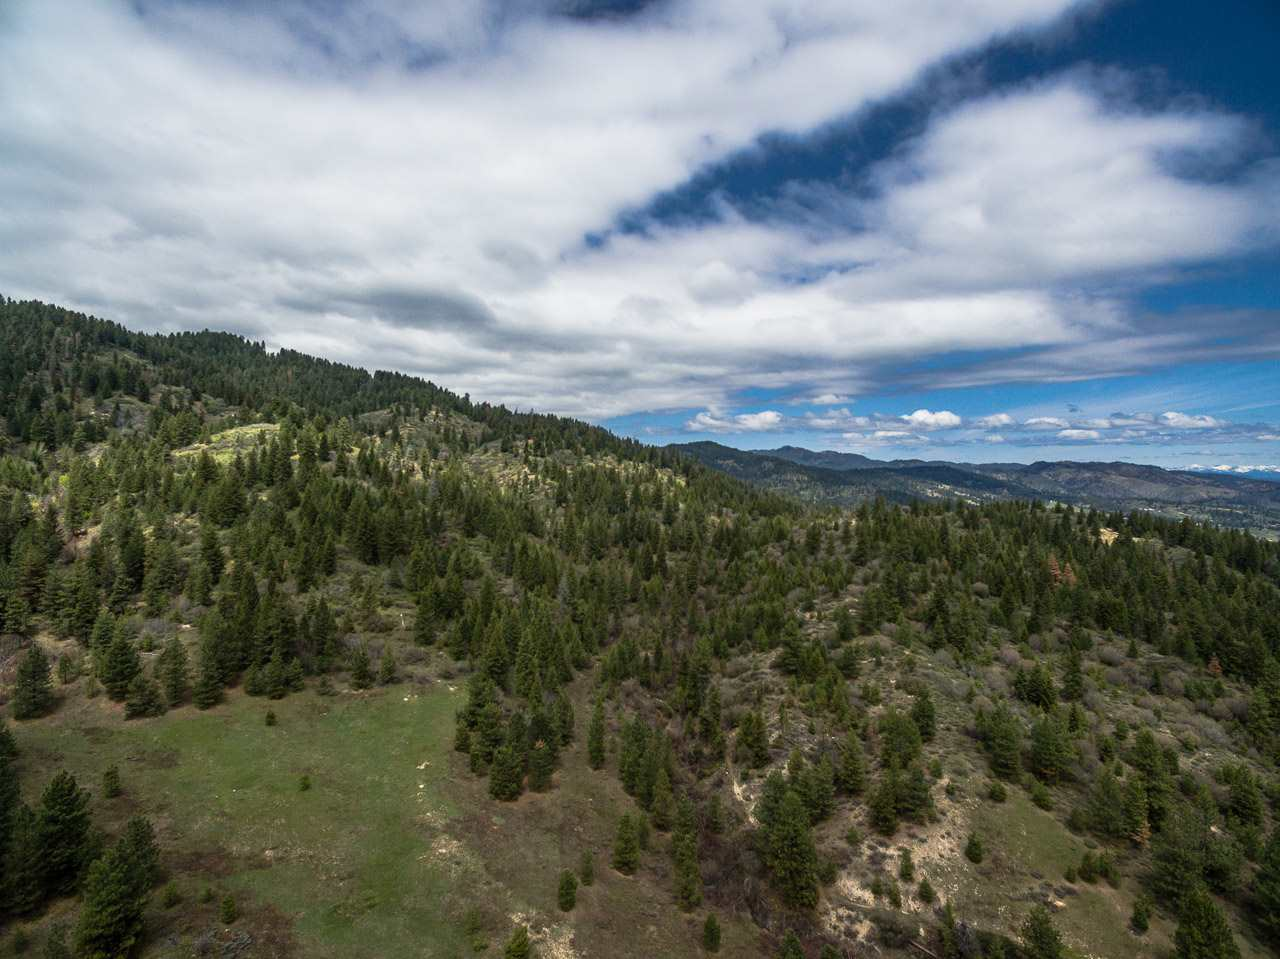 Lot 4 Summit View, Boise, ID 83716